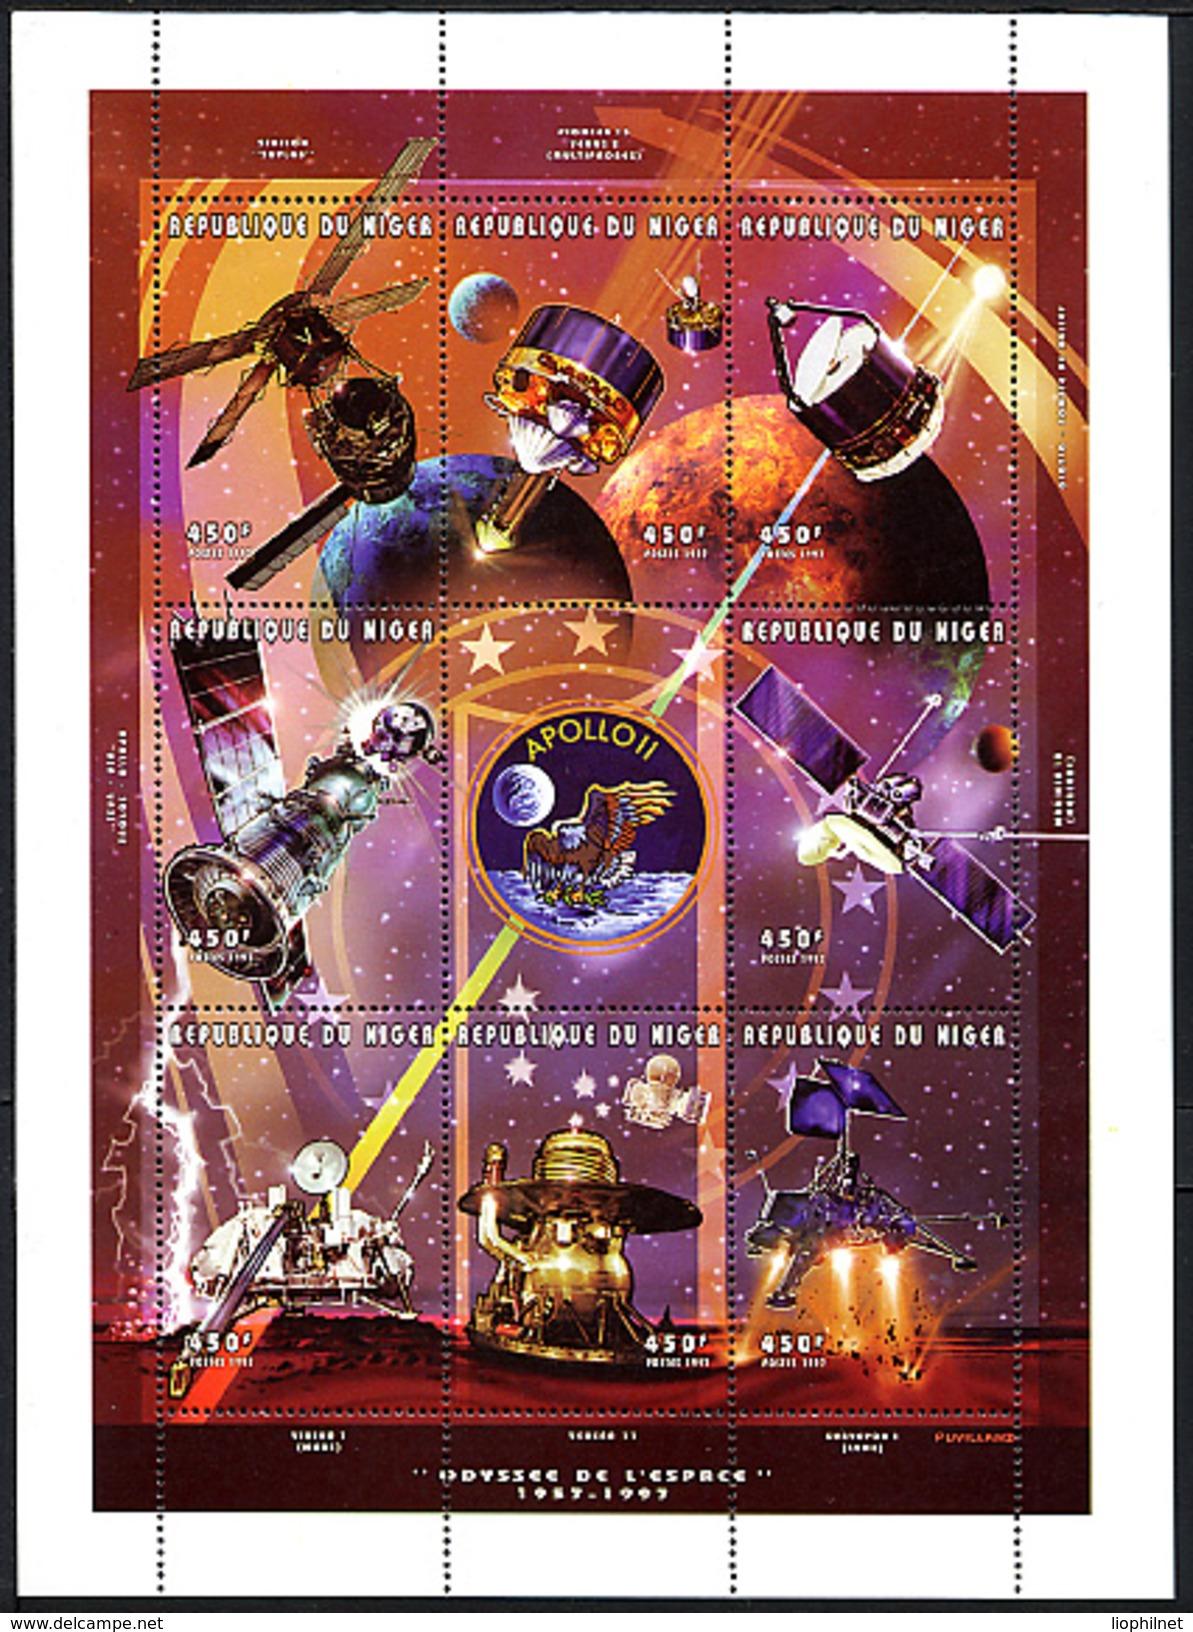 NIGER 1997, Espace Skylab Apollo-Soyouz Mariner 10 Venera II..., Feuillet 8 Valeurs, Neuf / Mint. R417 - Africa